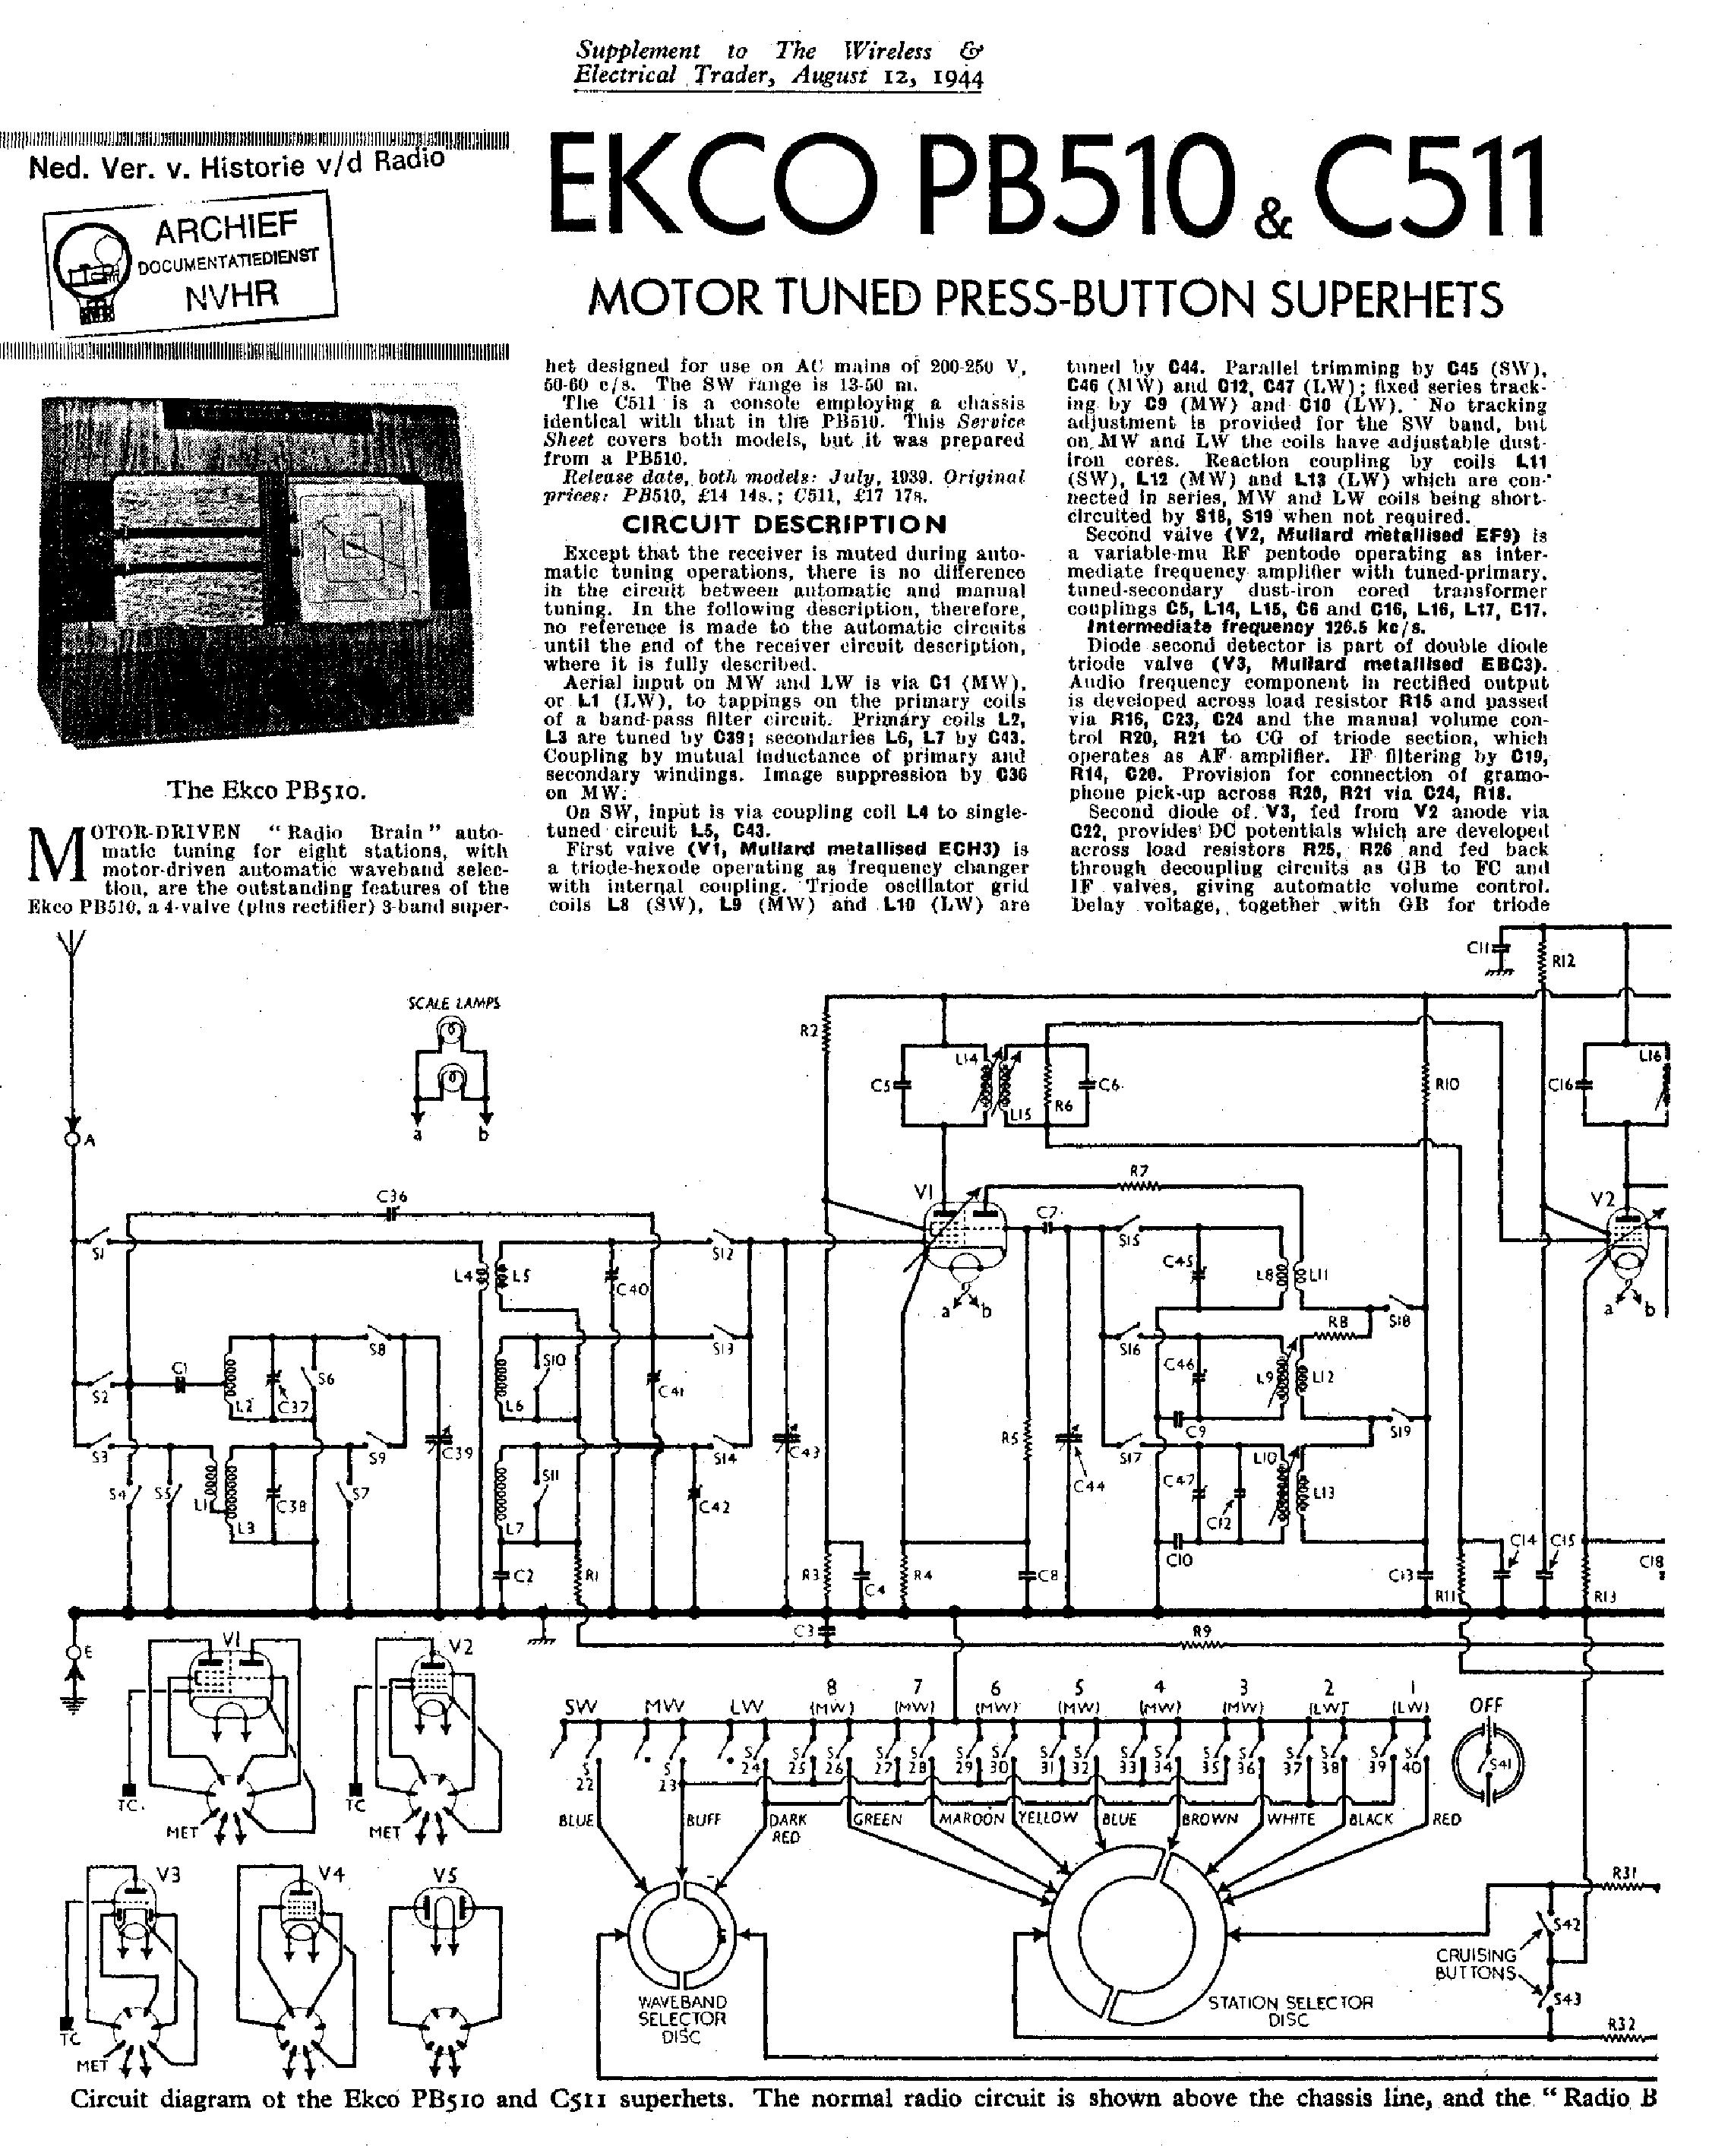 EKCO A28 Service Manual download, schematics, eeprom